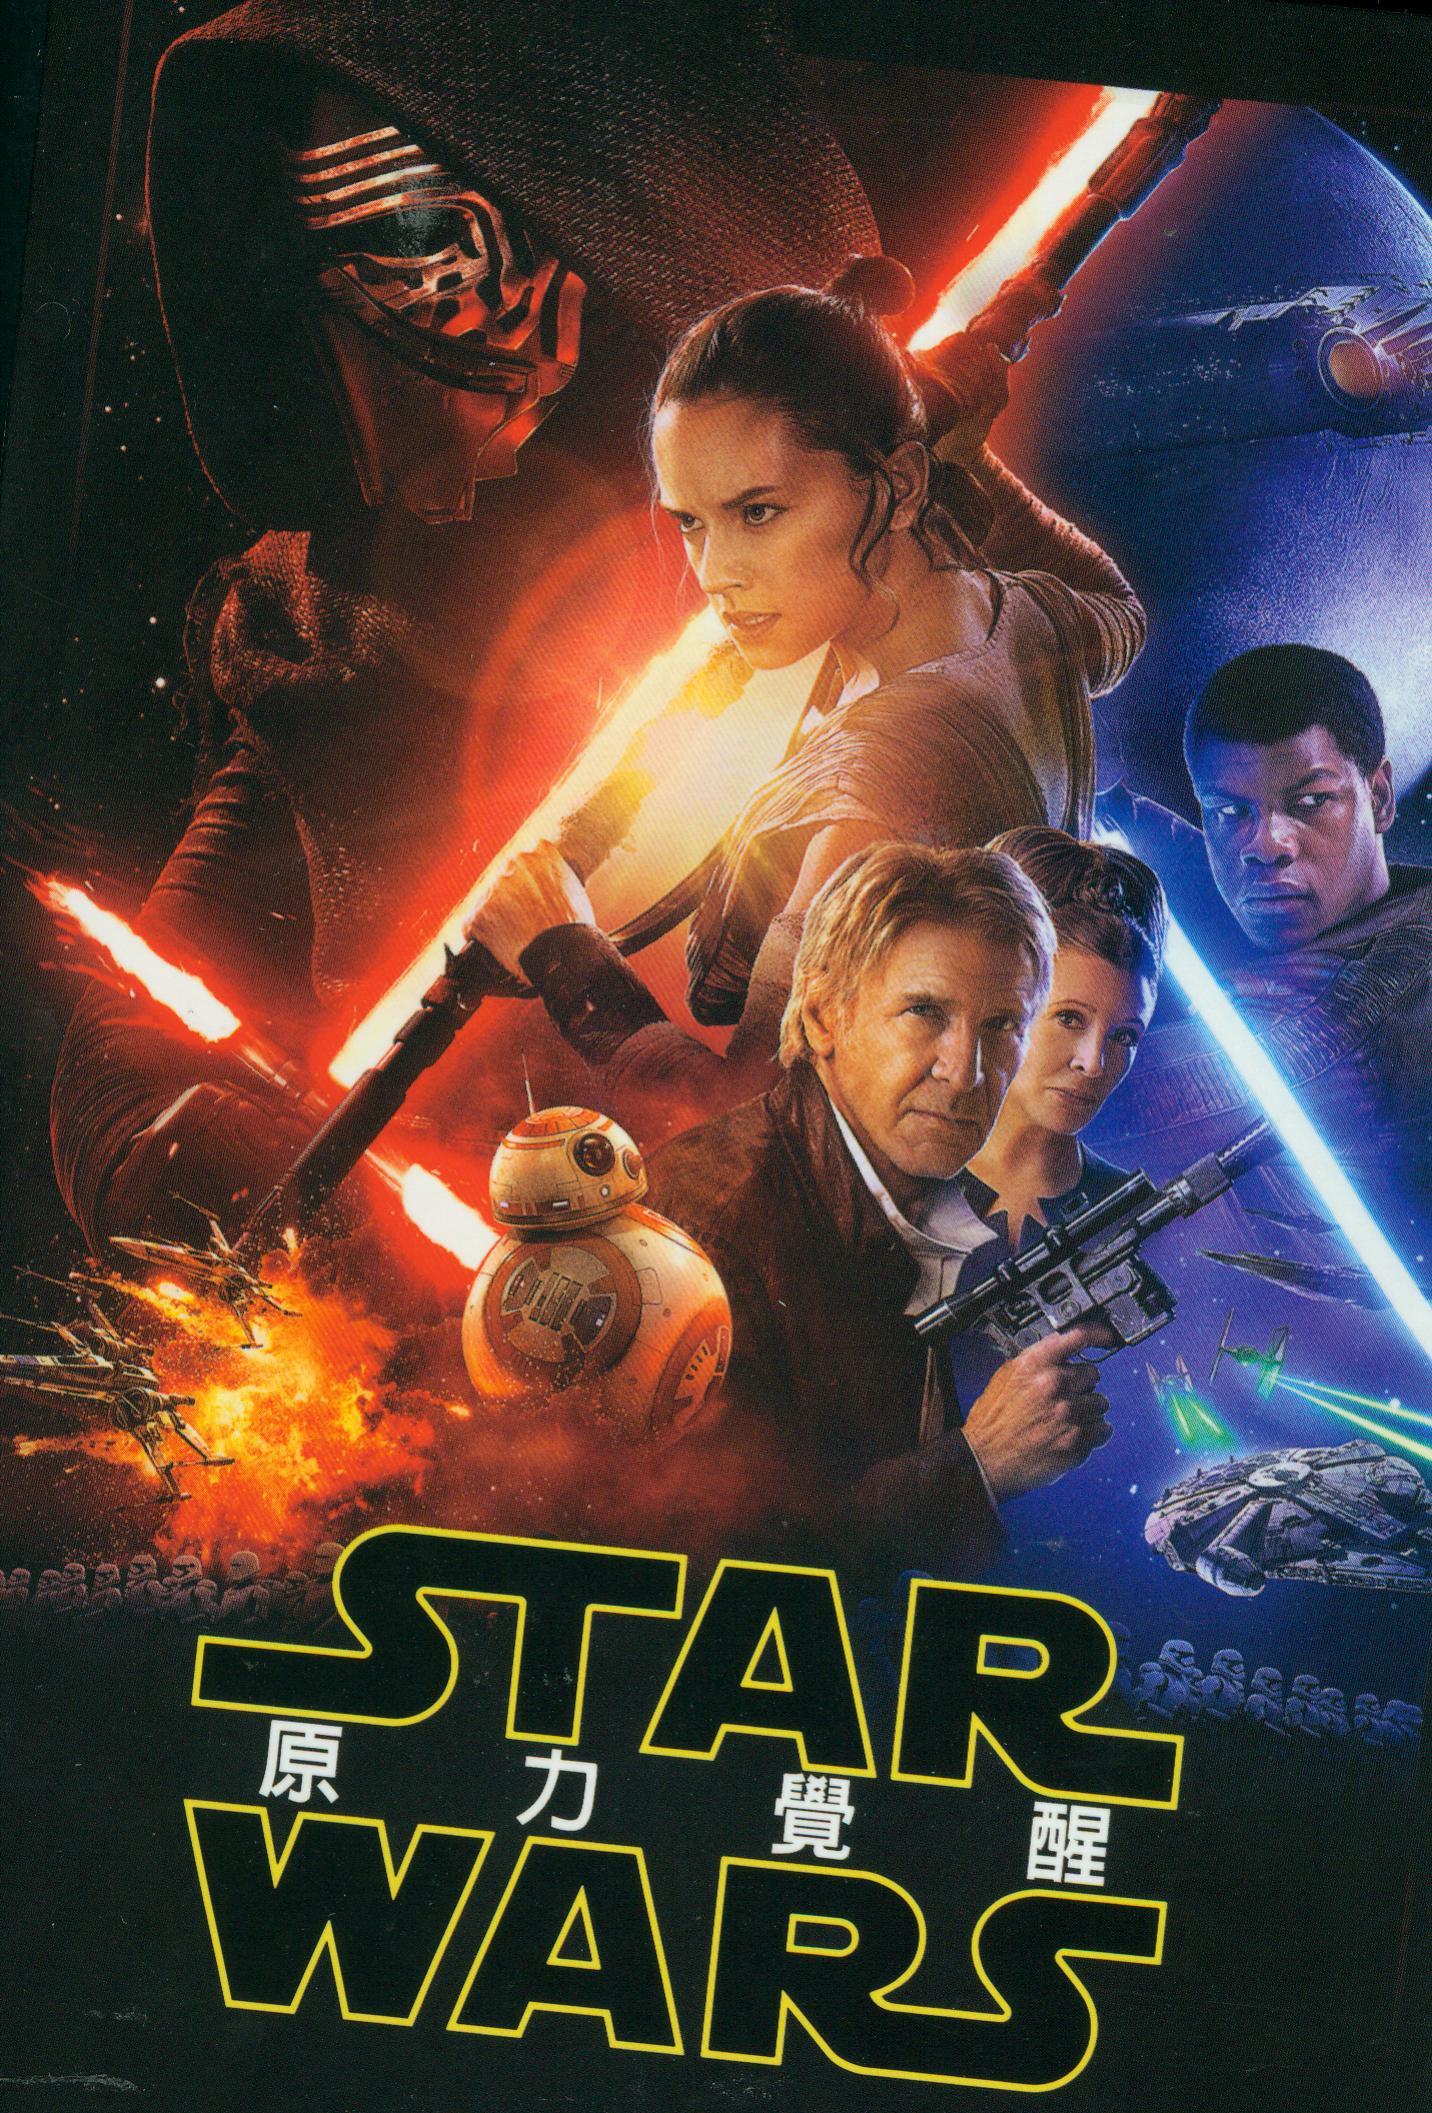 Star wars[普遍級:科幻] : 原力覺醒 = Star Wars : the force awakens